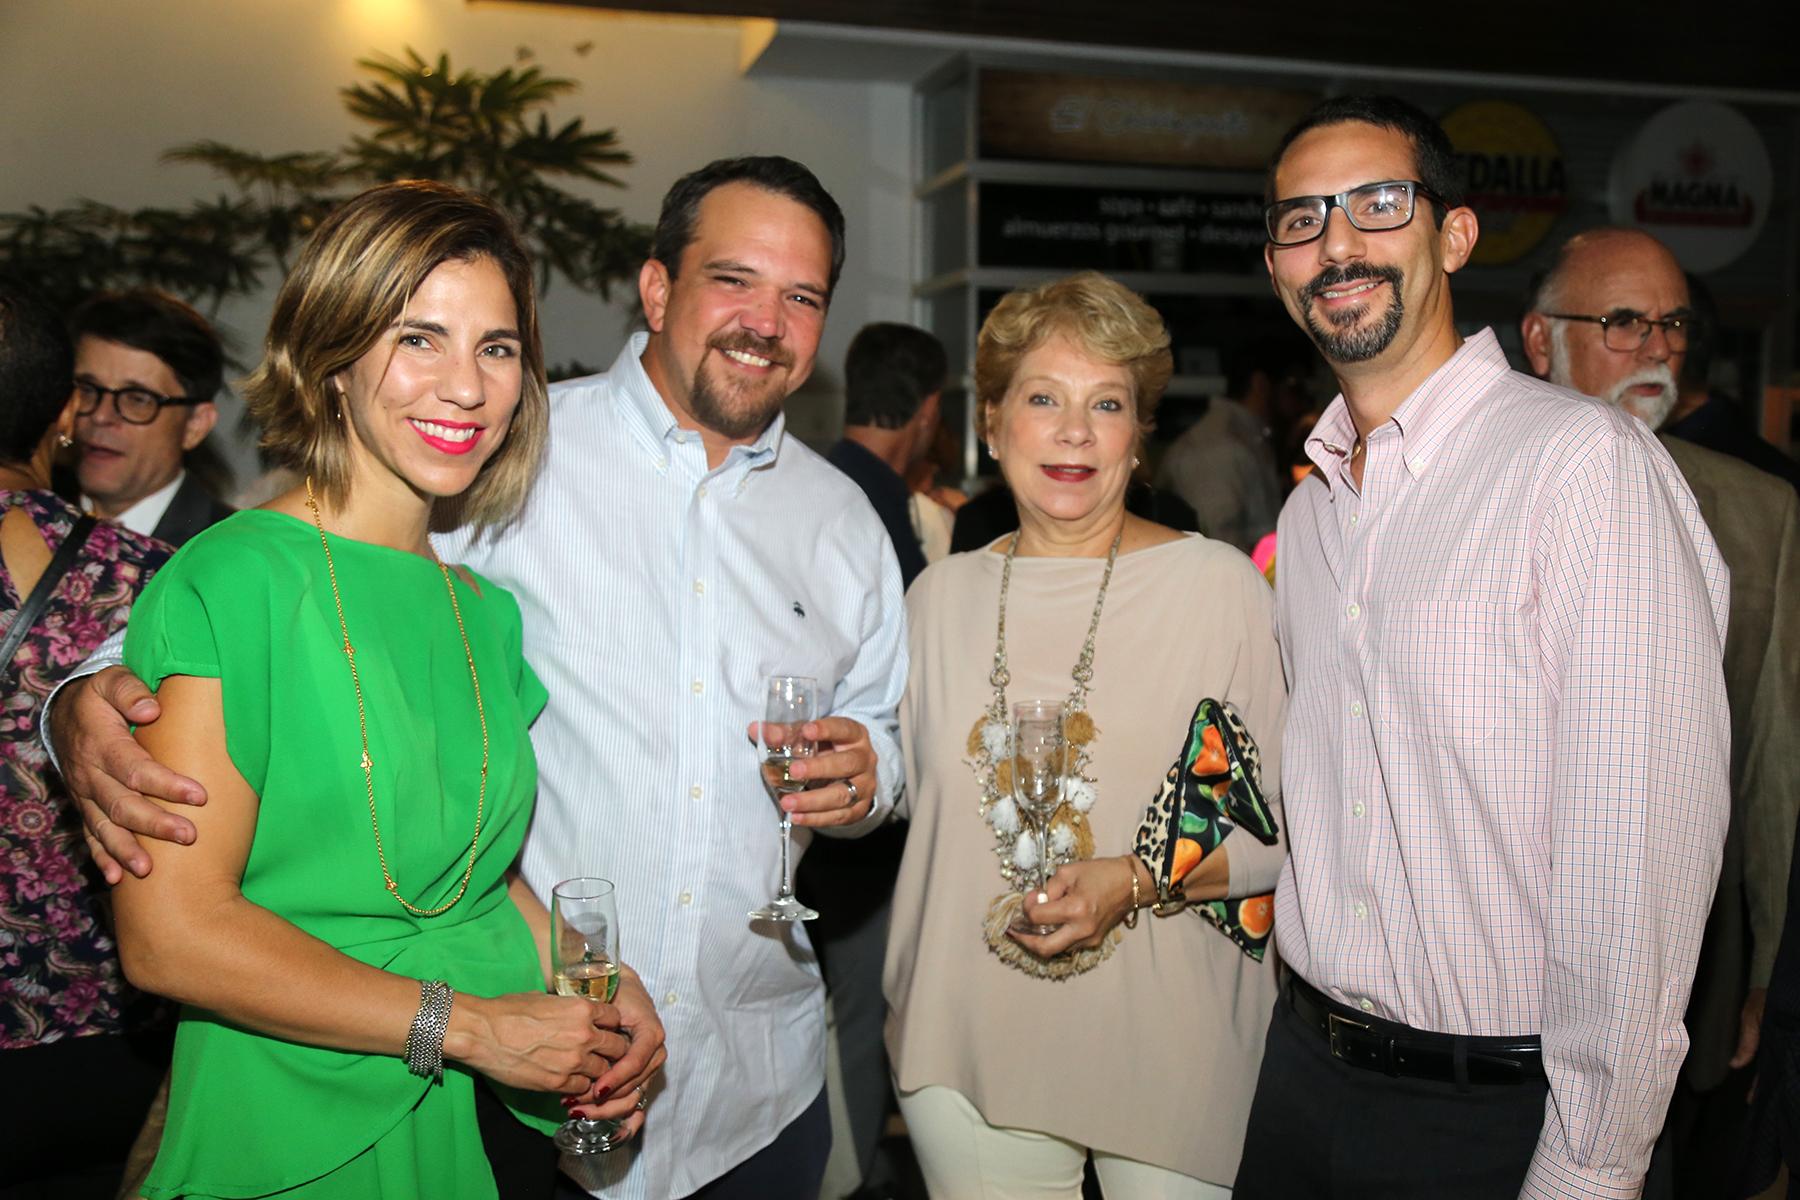 Rosita Rodríguez, Francisco de Zengotita, Rosita Vélez y Luis Rodríguez. (Foto: Nichole Saldarriaga)